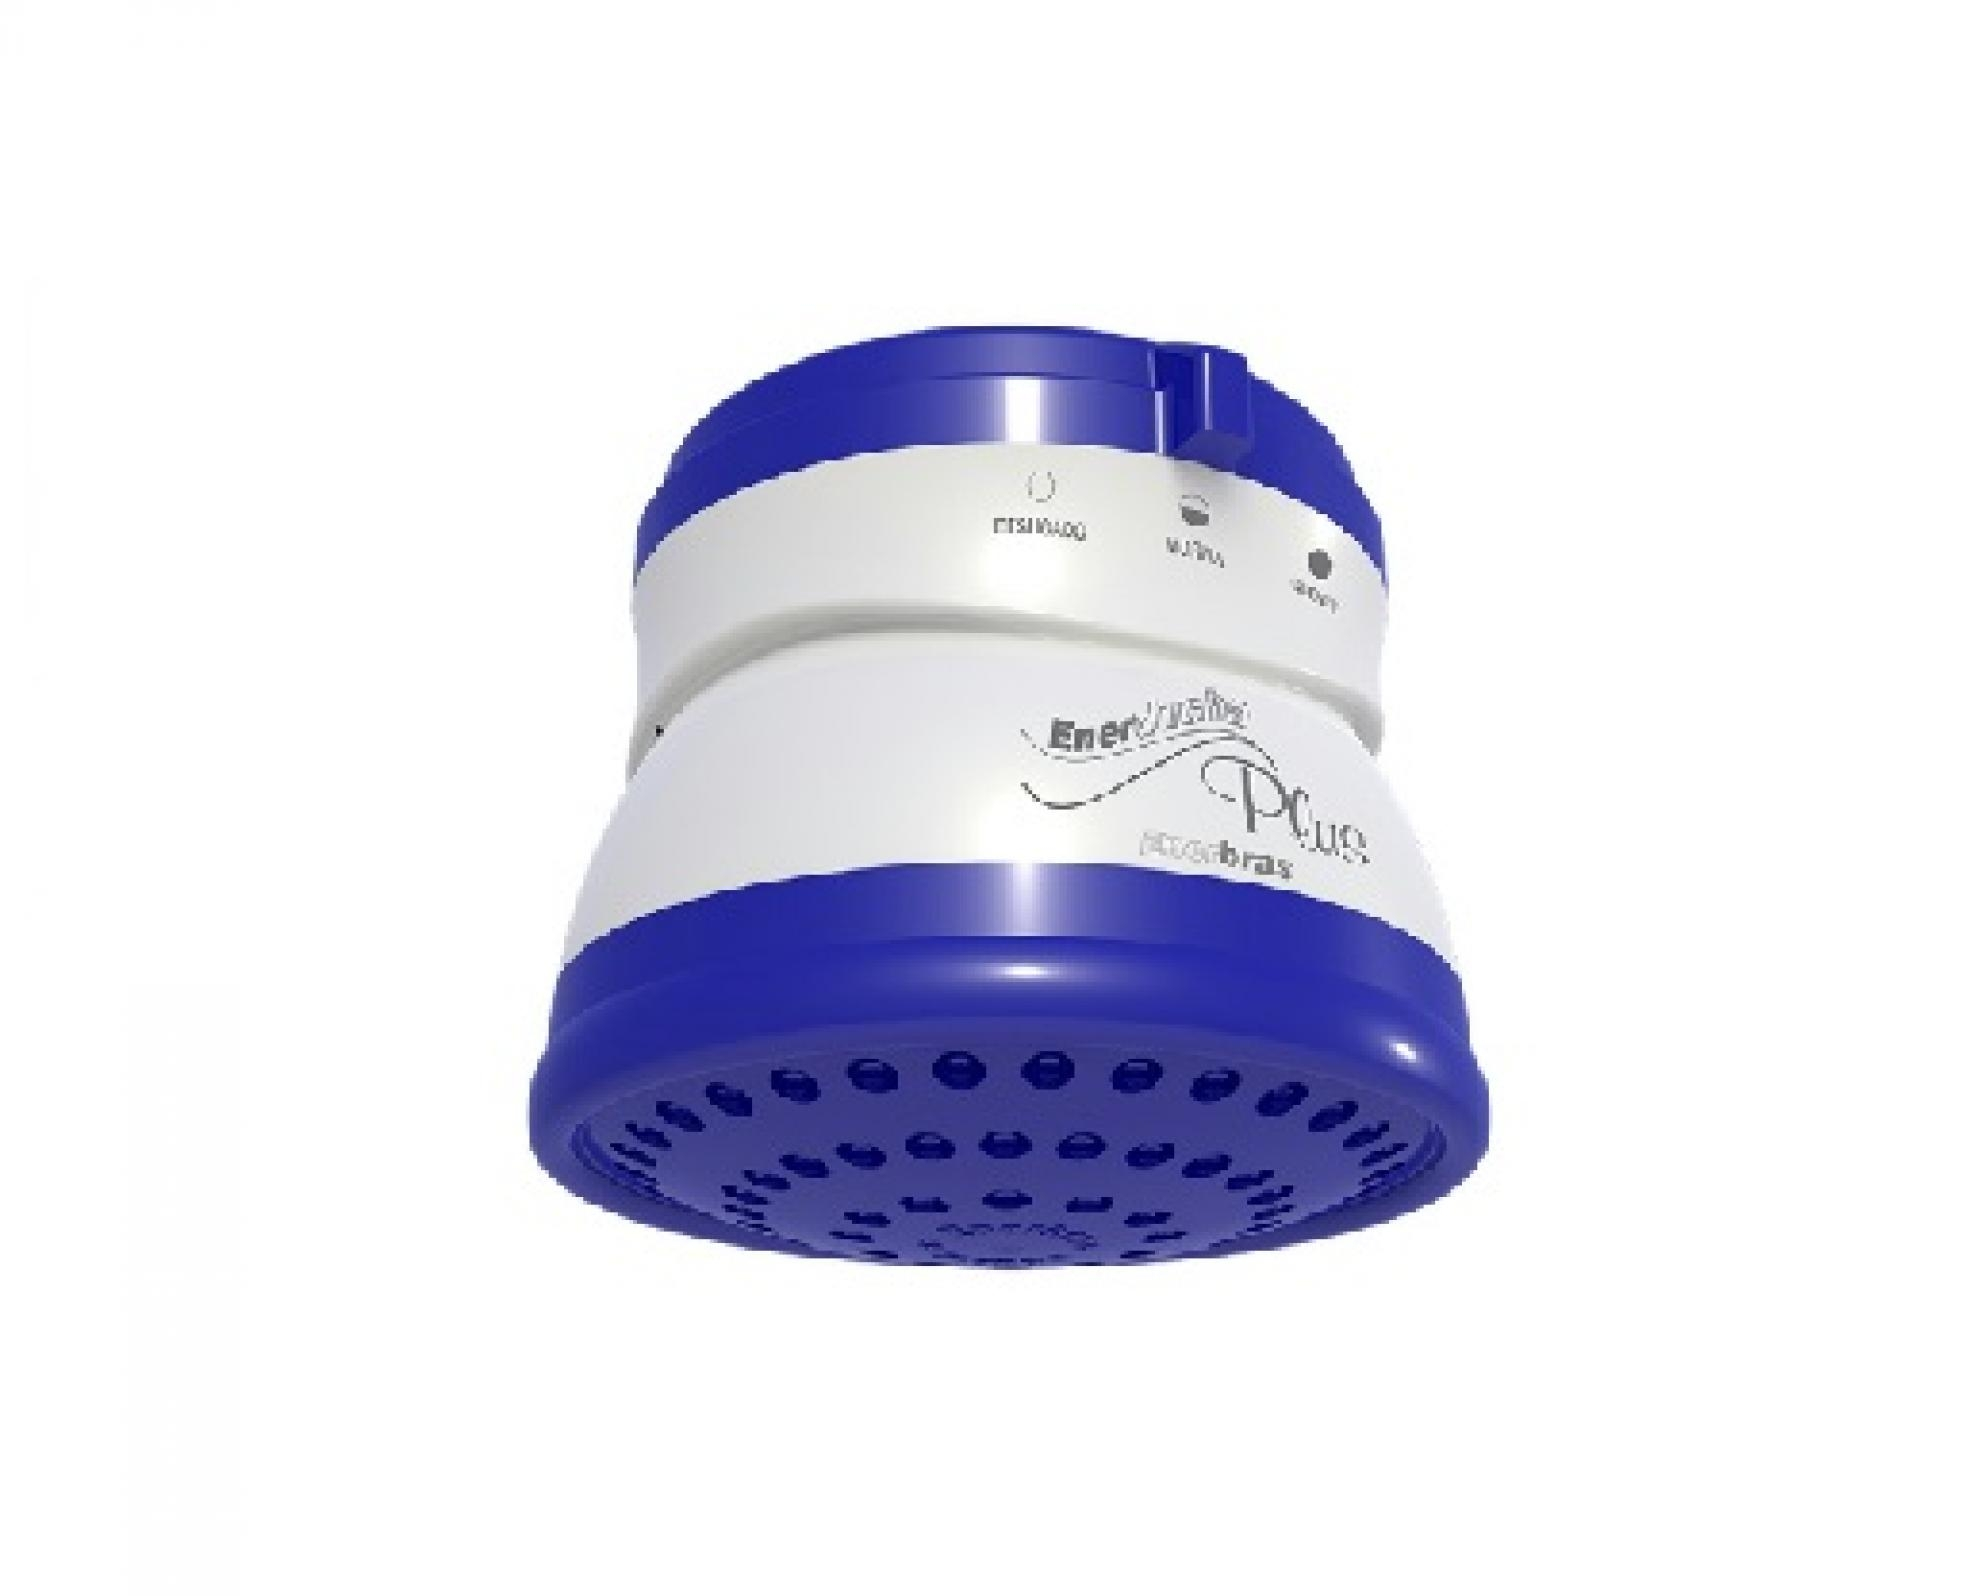 Chuveiro Enerducha Plus 440W/220 - Azul